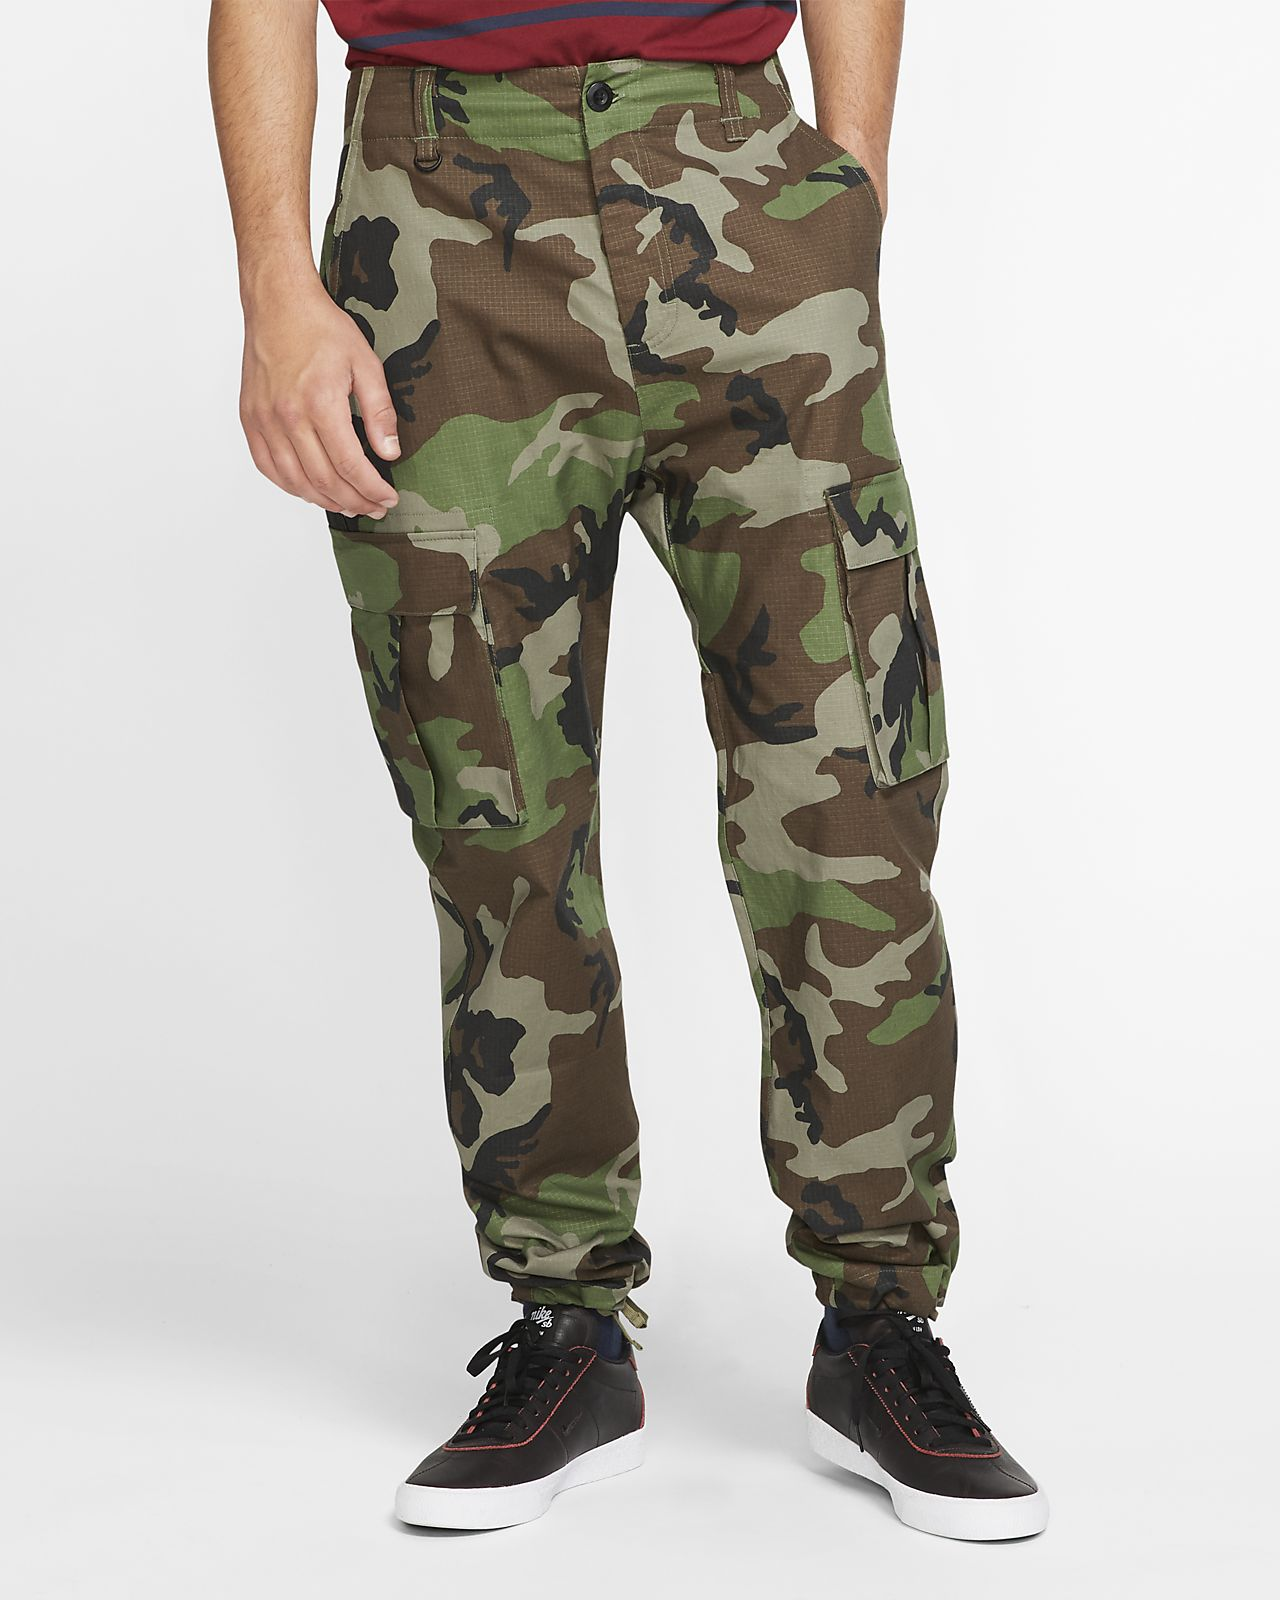 Pantaloni cargo da skateboard camo Nike SB Flex FTM - Uomo